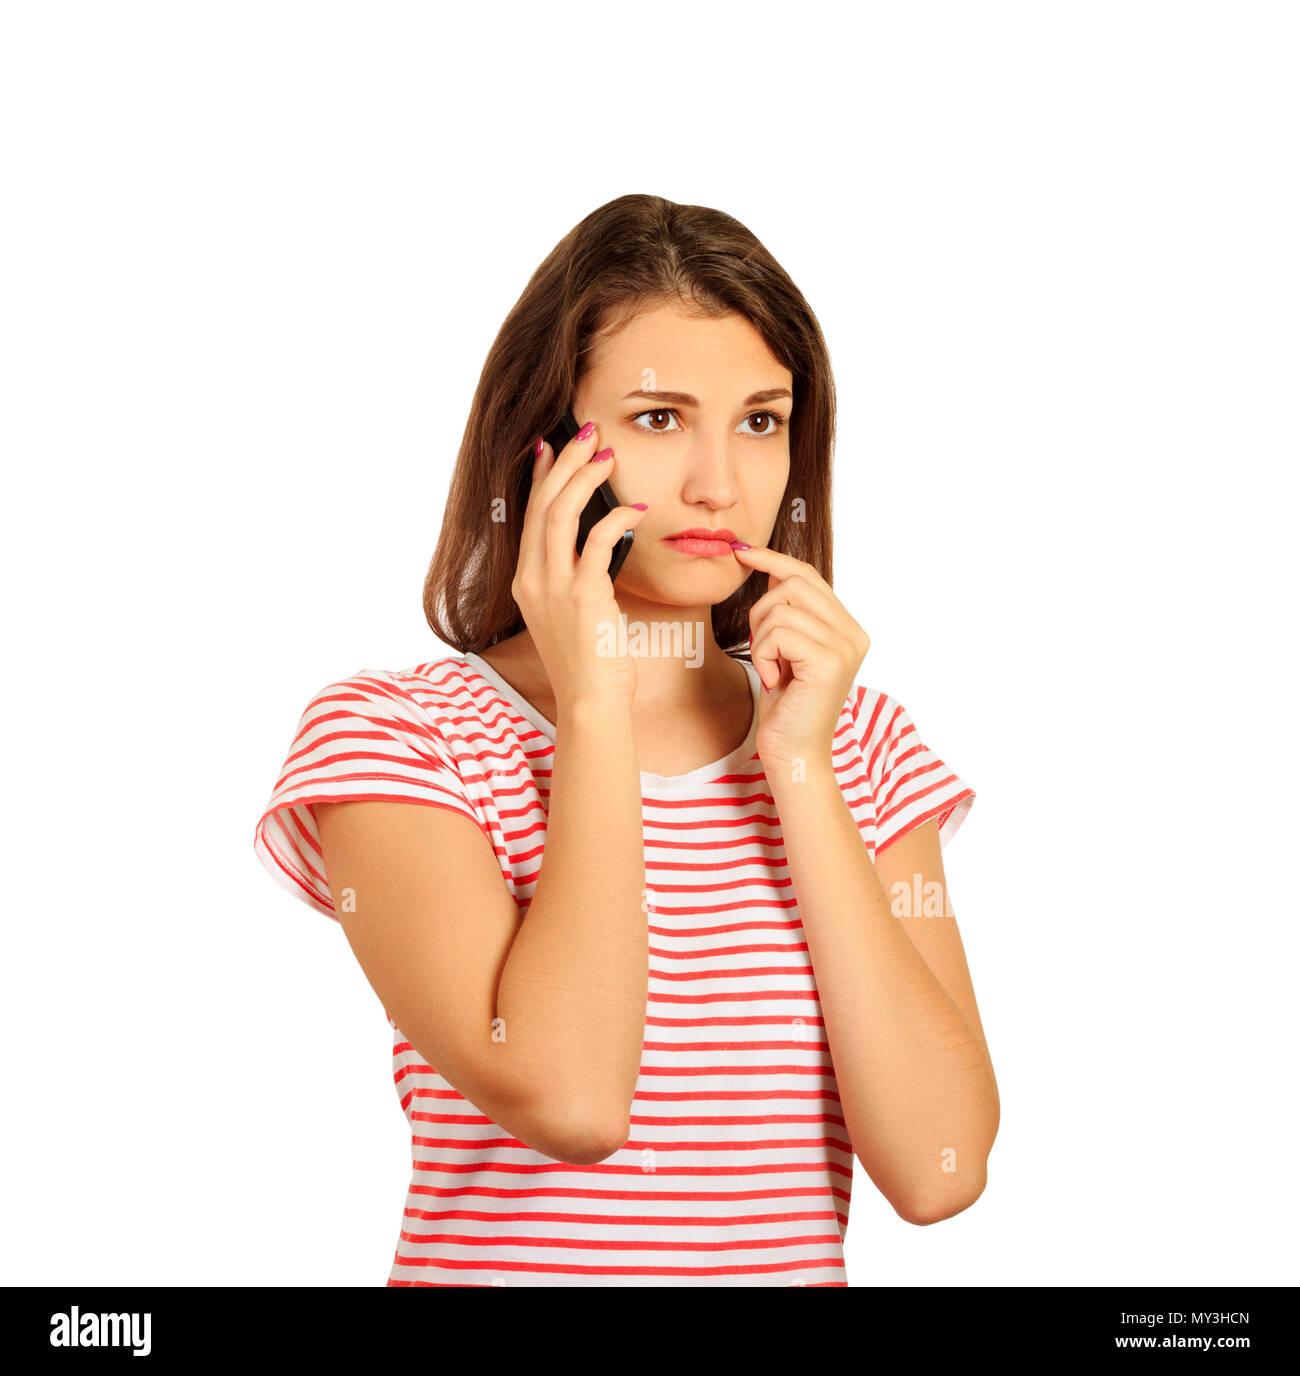 Phone call on girl 5 Ways